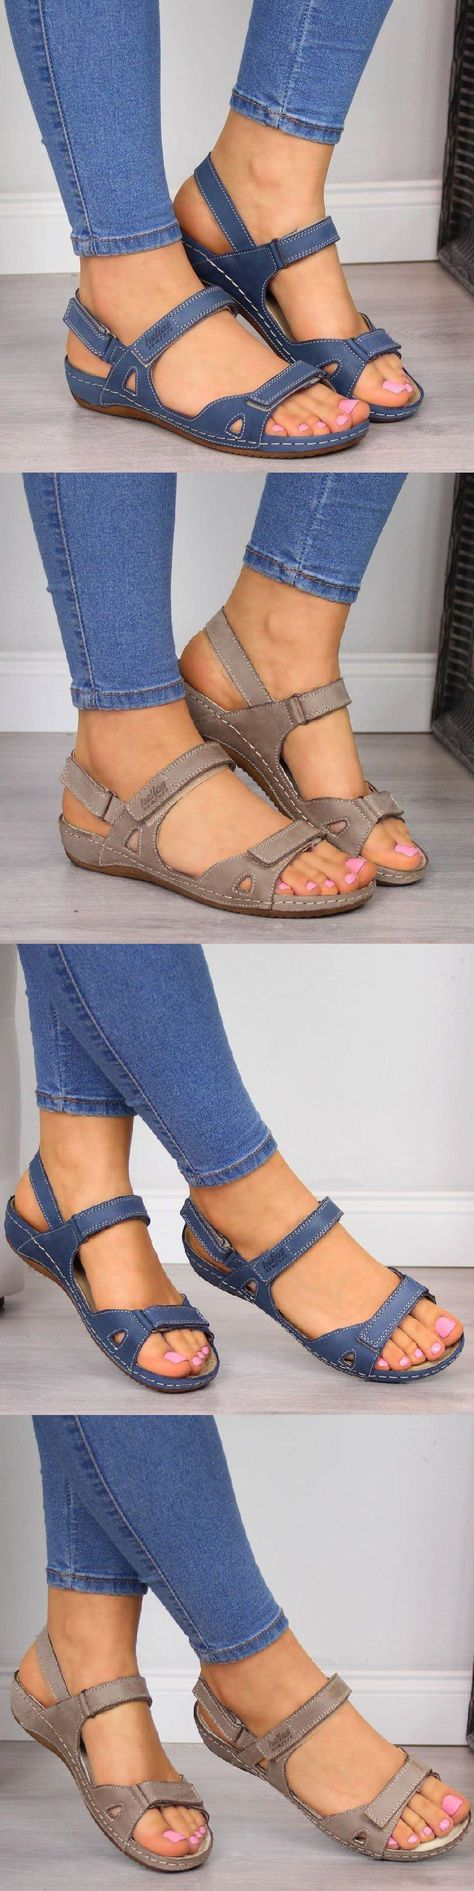 213 Best Shoes images Shoes, Me too skor, Shoe boots  Shoes, Me too shoes, Shoe boots